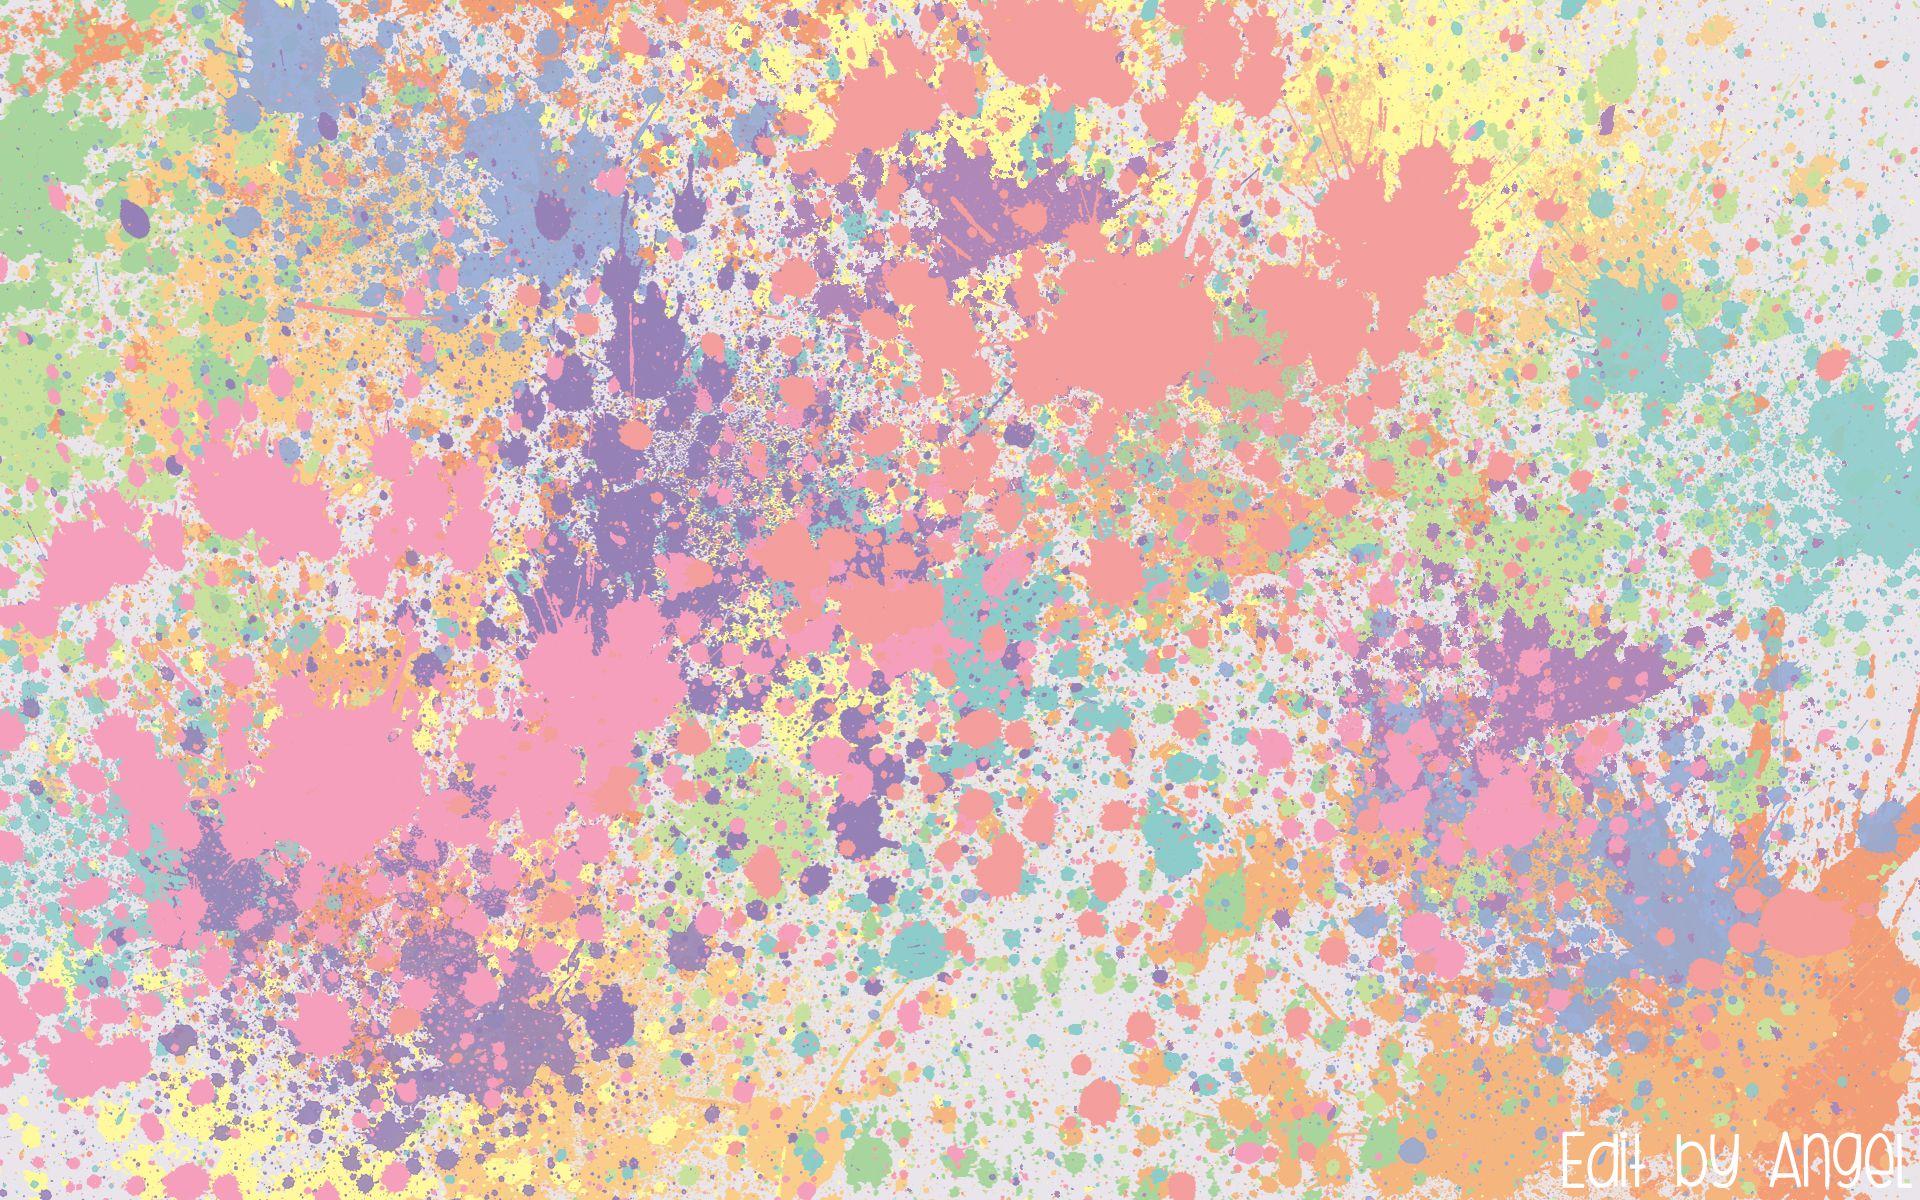 My Bird Dotty So Spotty Inspiration Goth Wallpaper Cute Iphone Wallpaper Tumblr Cute Patterns Wallpaper